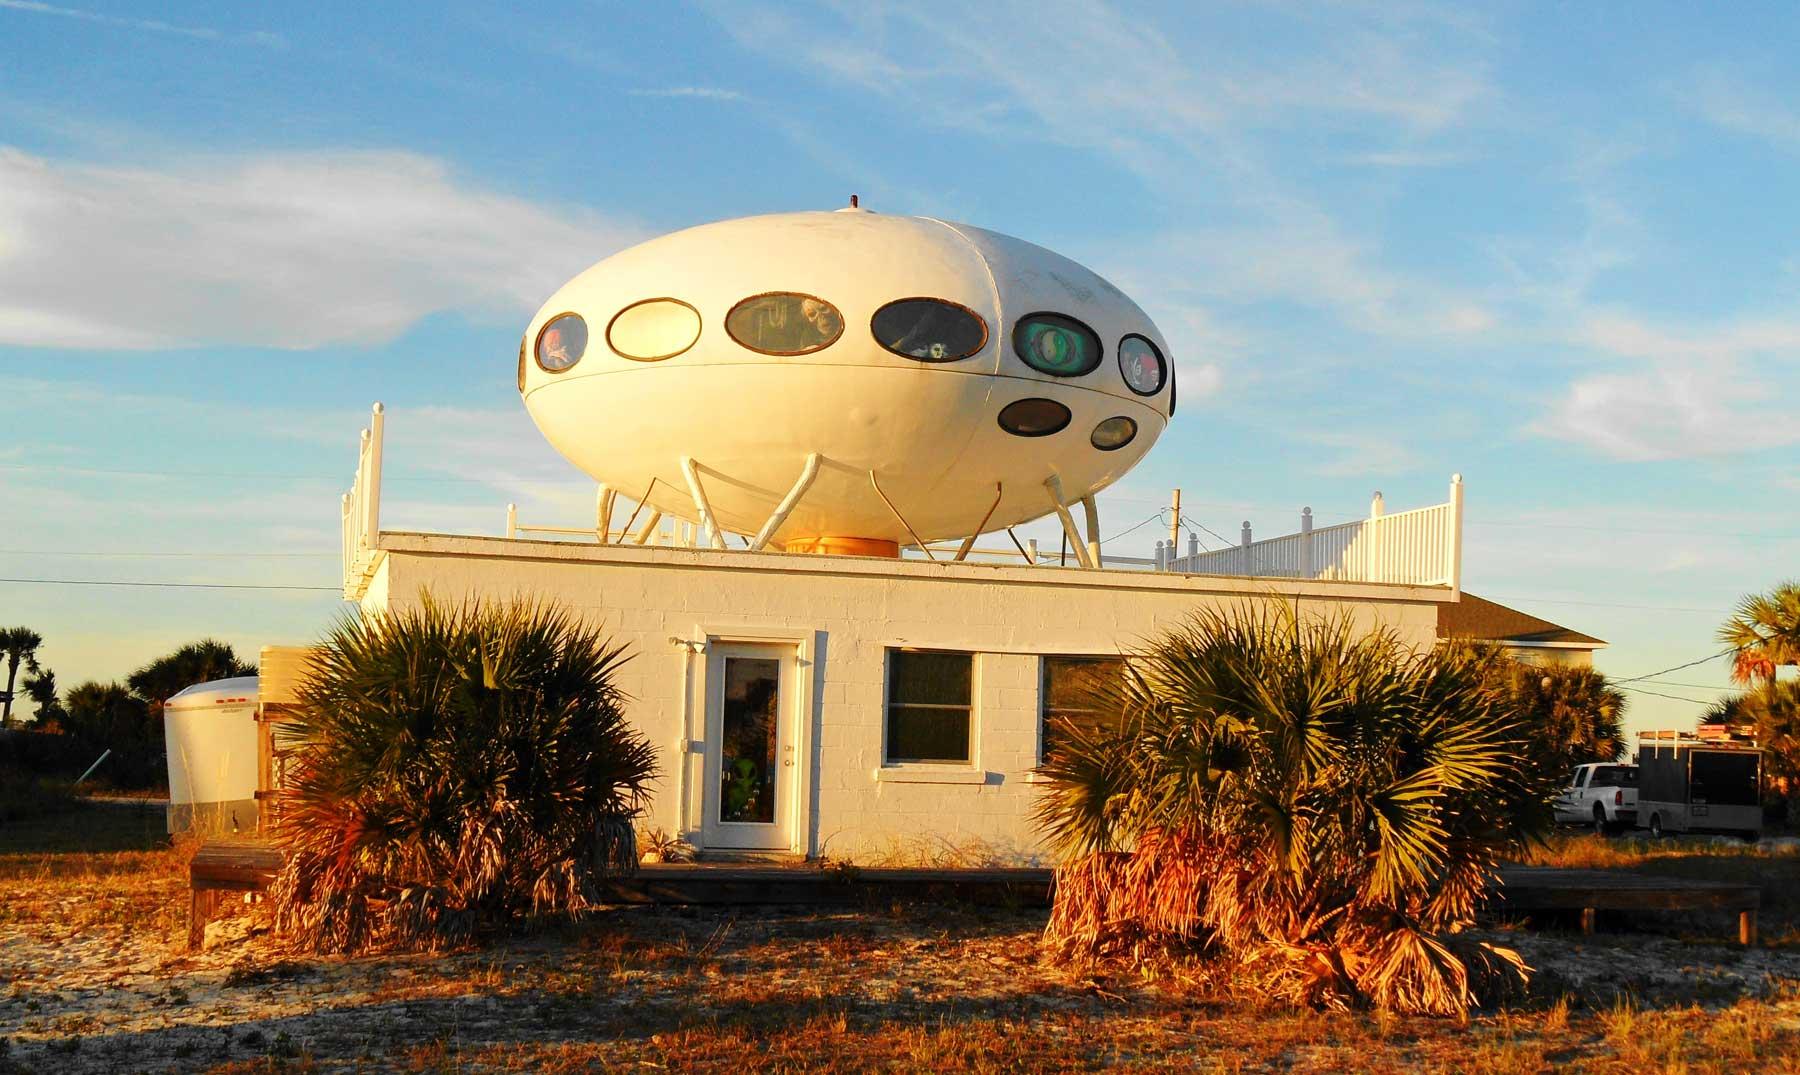 La casa OVNI de Pensacola Beach